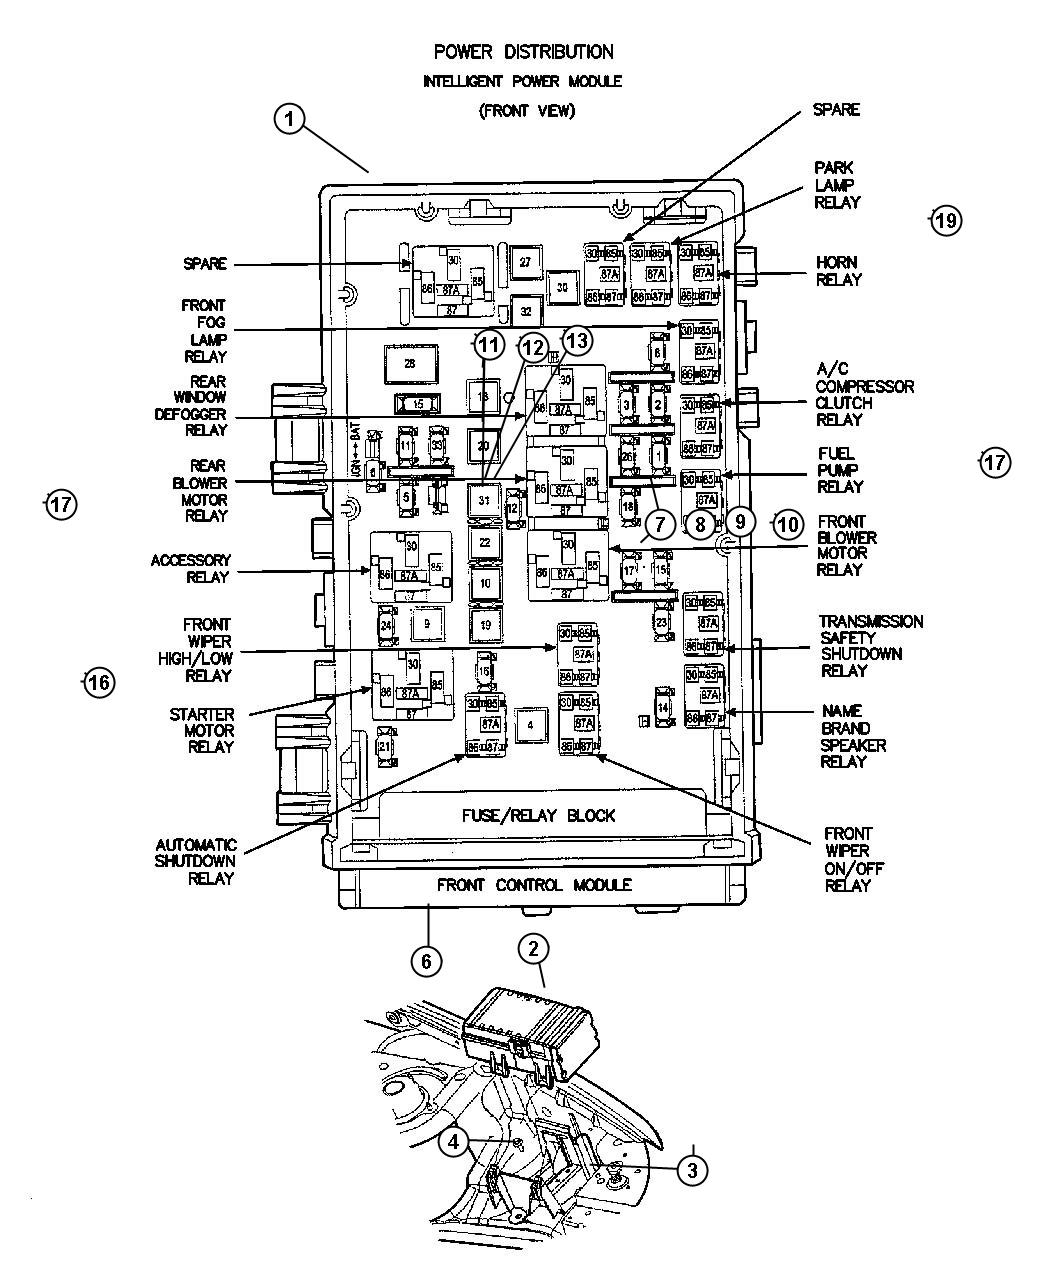 2001 Dodge Power Distribution Center Diagram